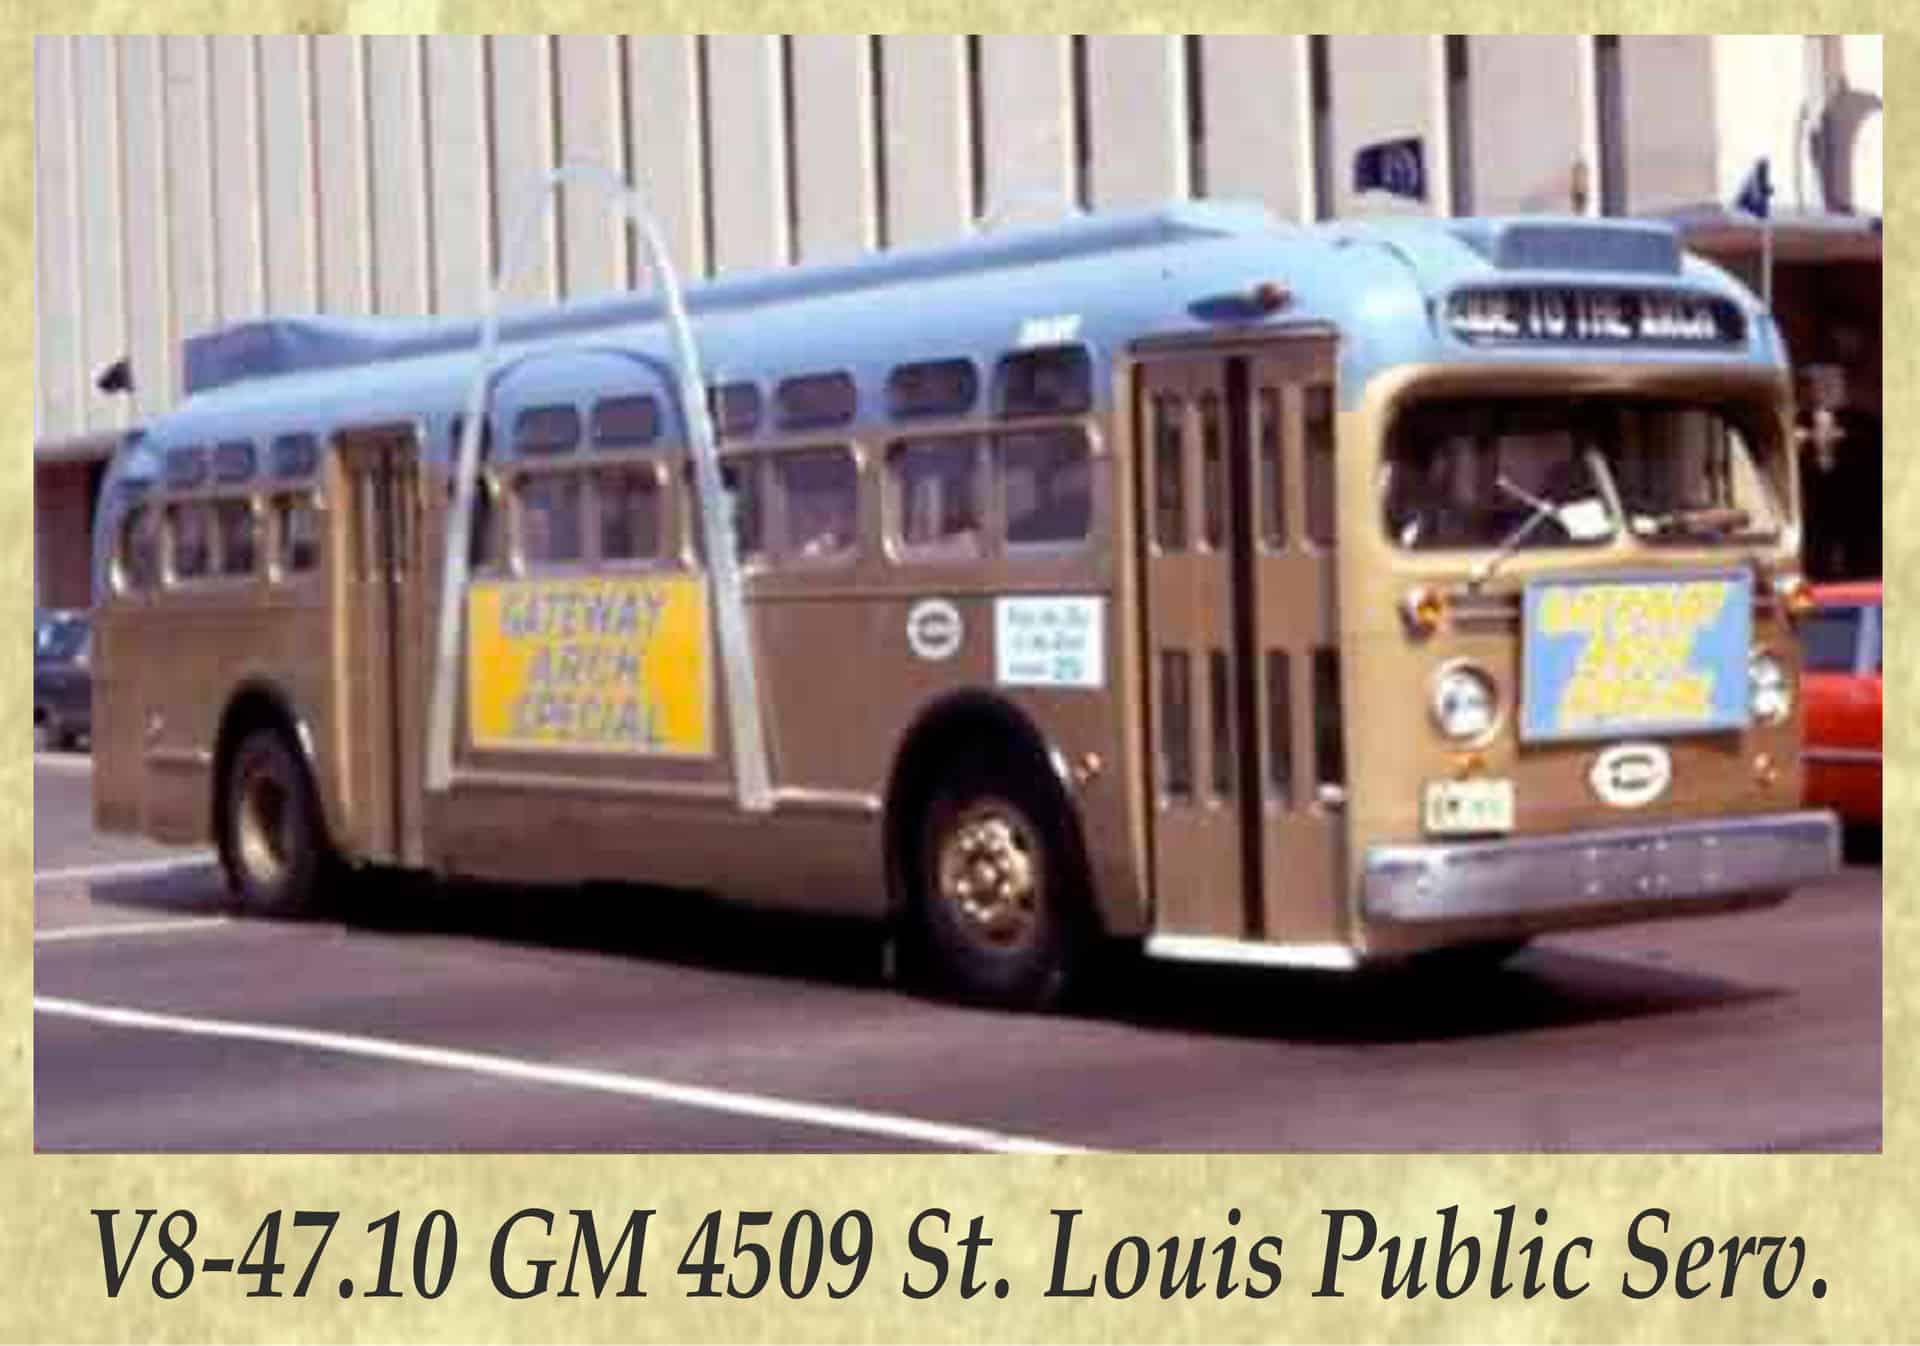 V8-47.10 GM 4509 St. Louis Public Serv.